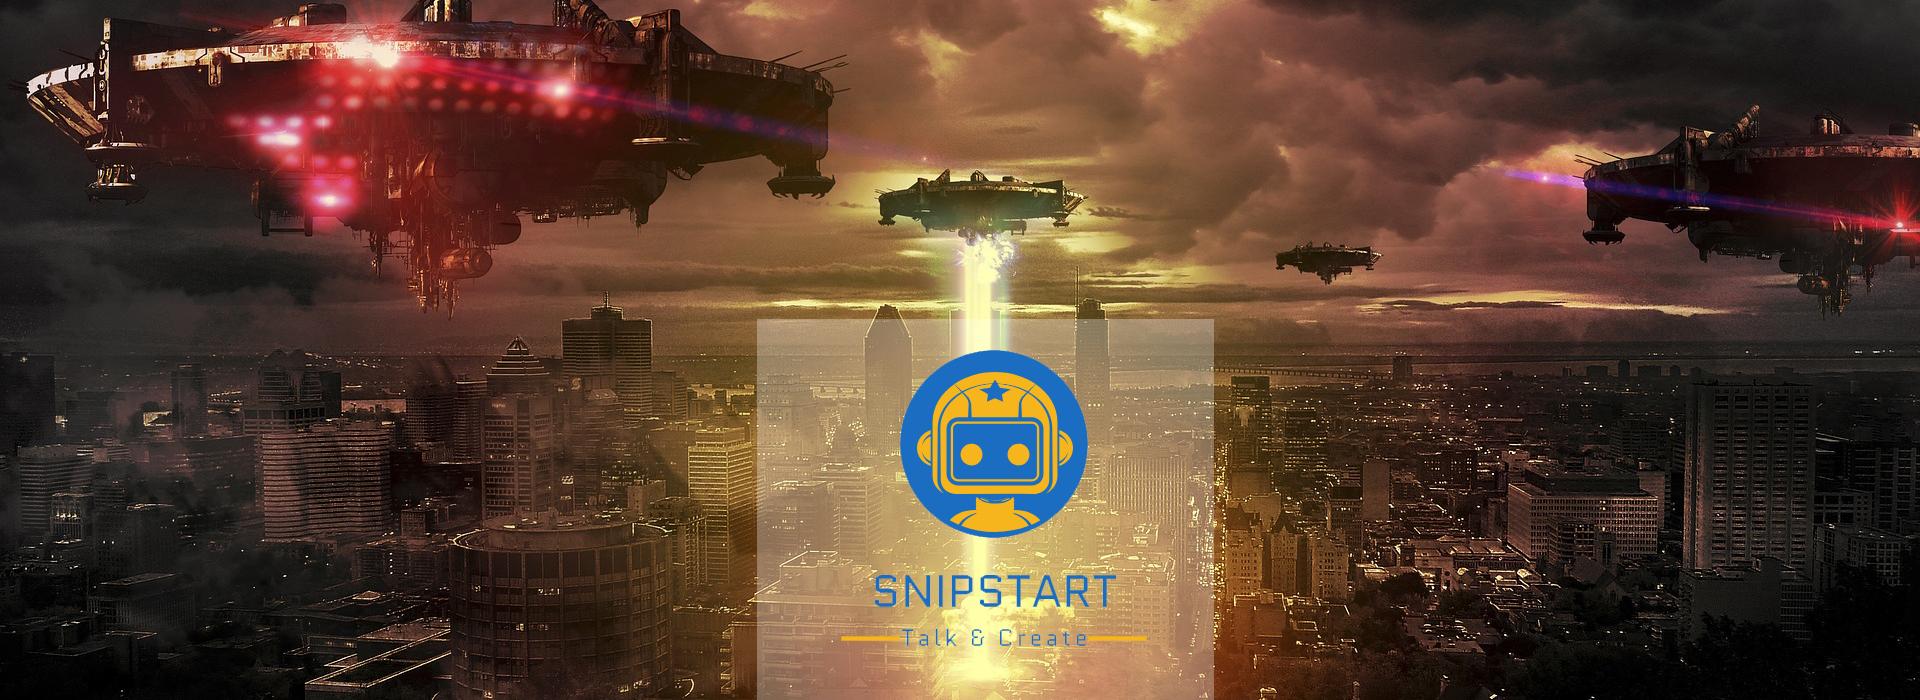 SnipStart